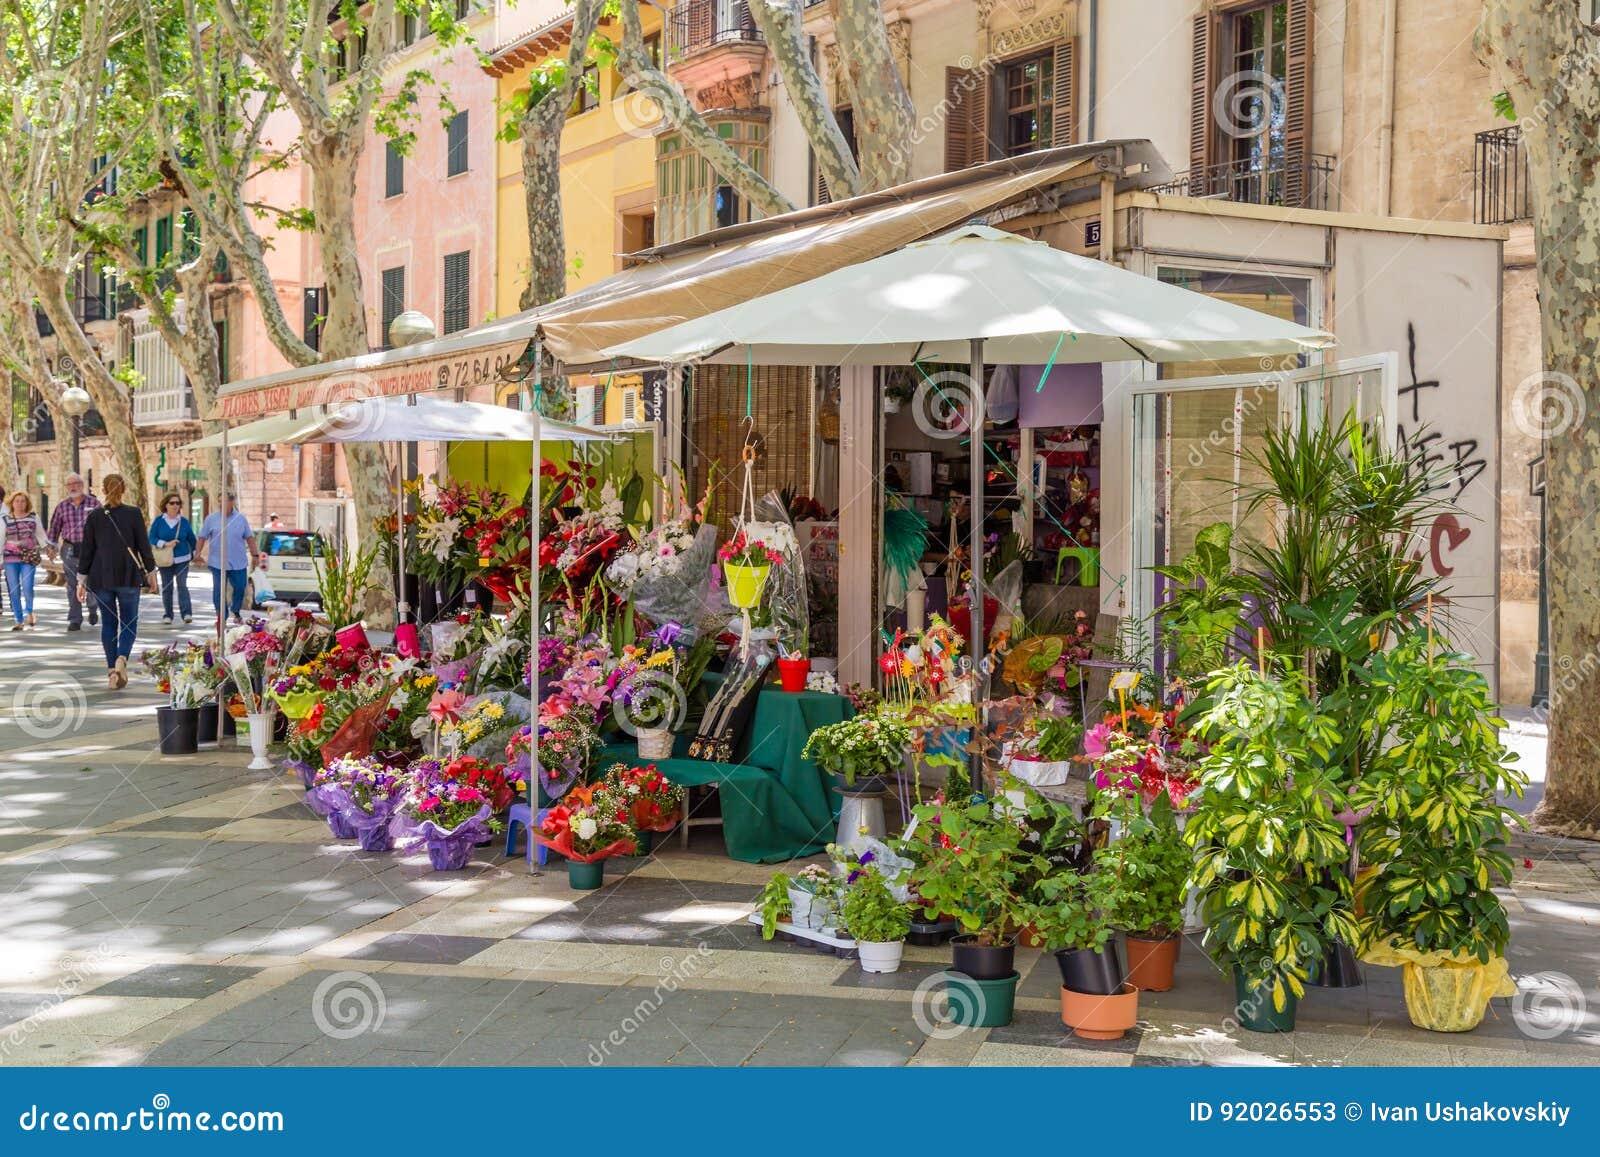 14 Maj 2016 Blomsterhandel i Palma de Mallorca, Spanien